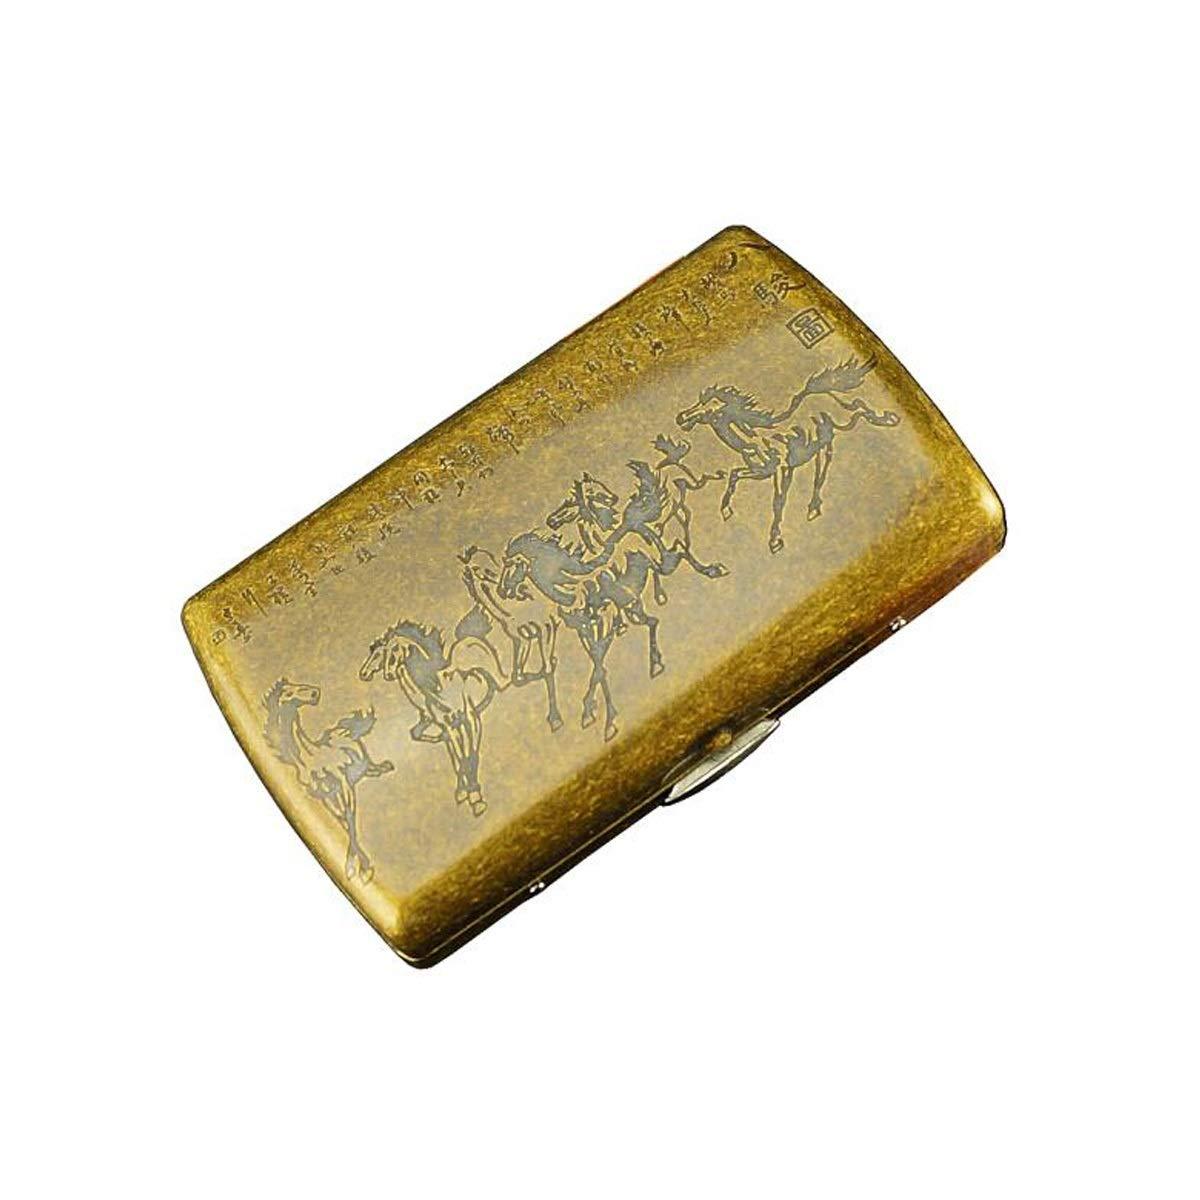 WENPINHUI Cigarette Case, Copper 12-Pack Cigarette Box, Metal Steel Clip Cigarette Box, Eight Horses (Color : Gold) by WENPINHUI